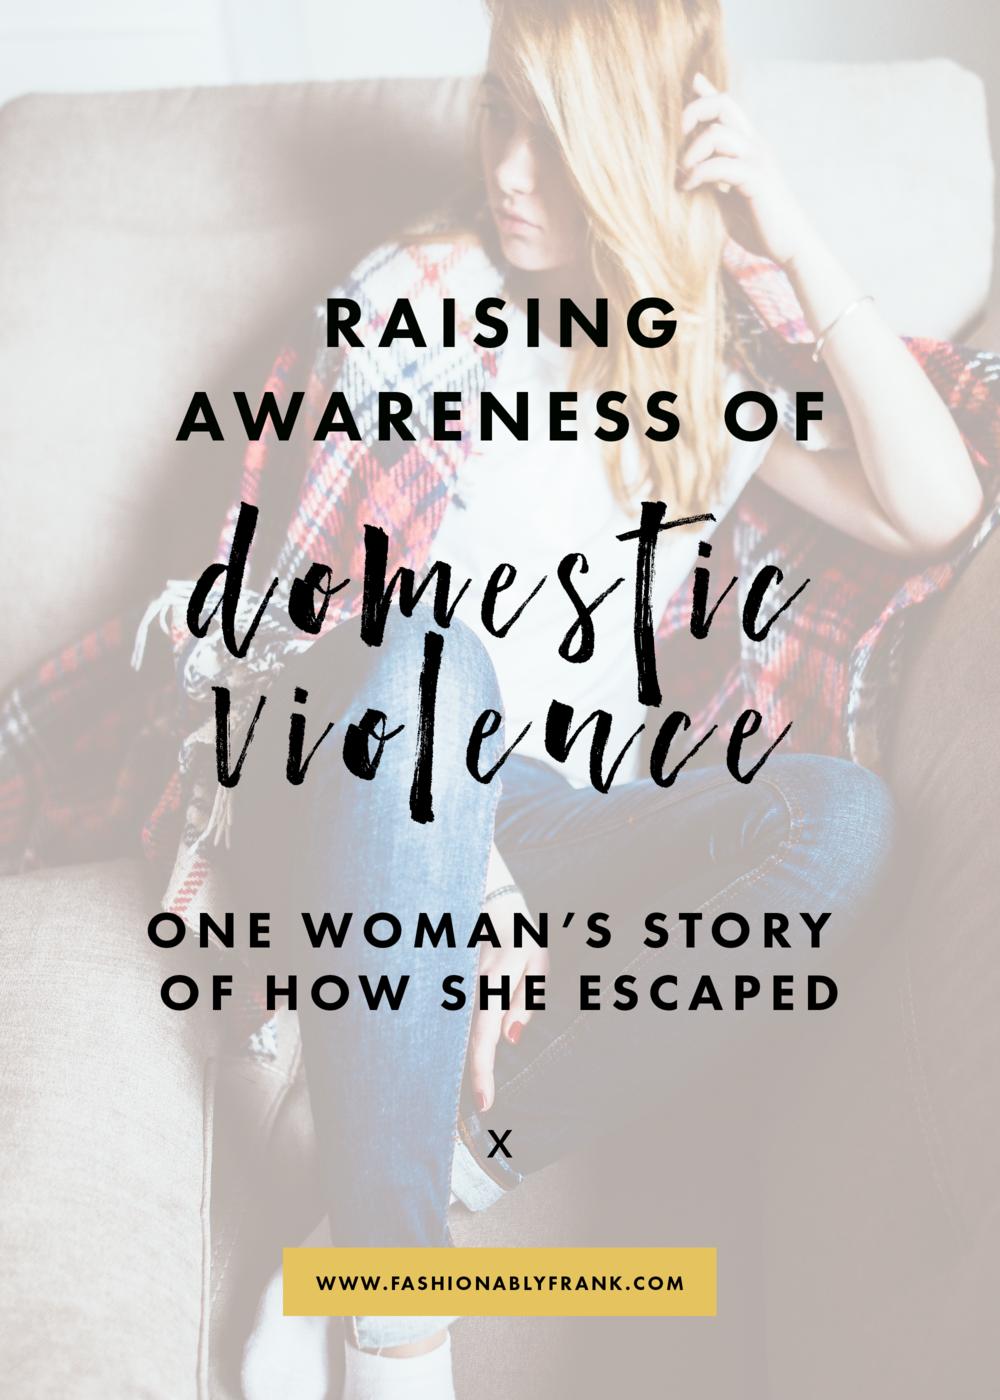 Raising Awareness of Domestic Violence